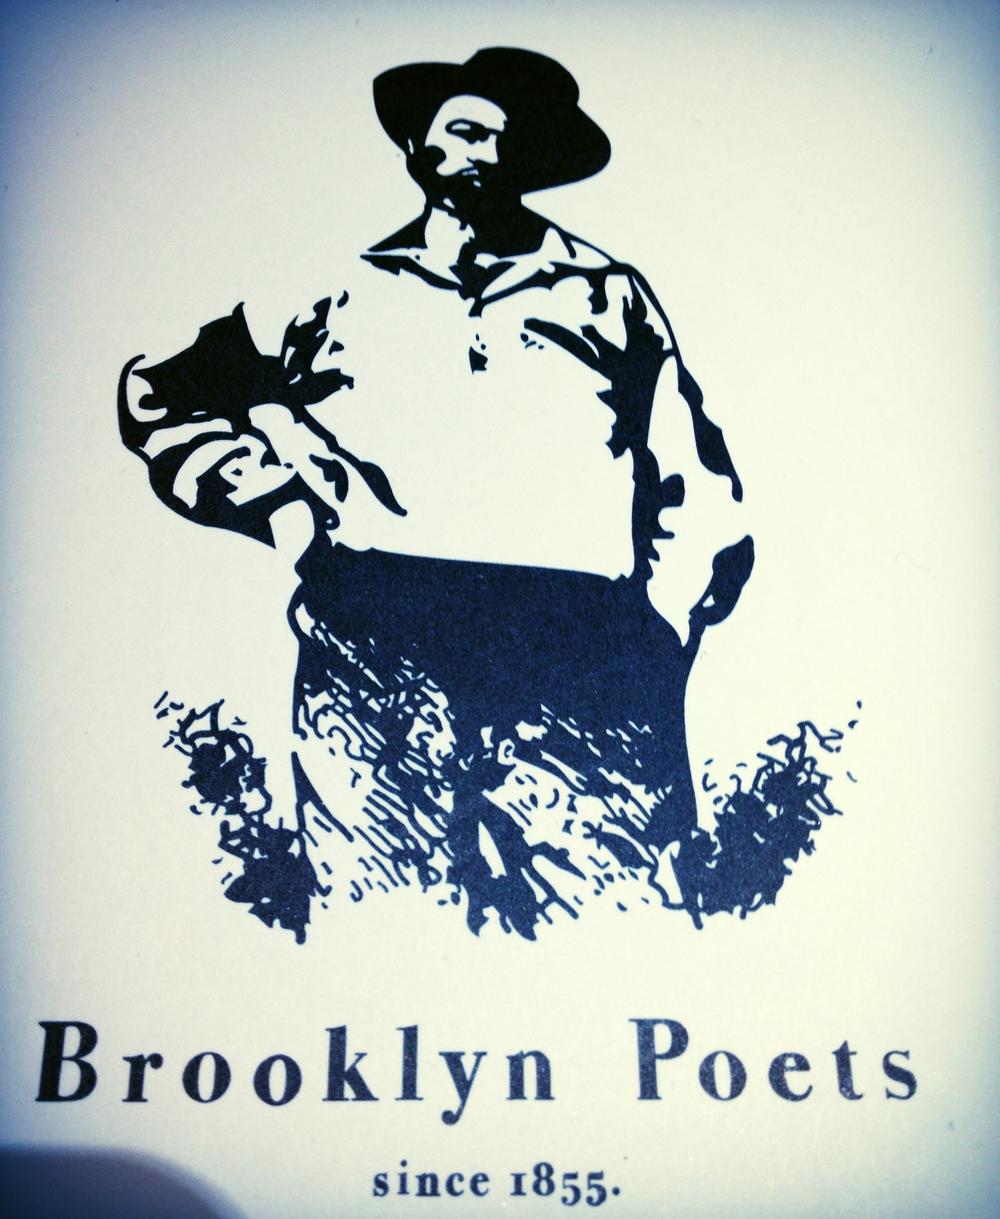 BrooklynPoets.jpg